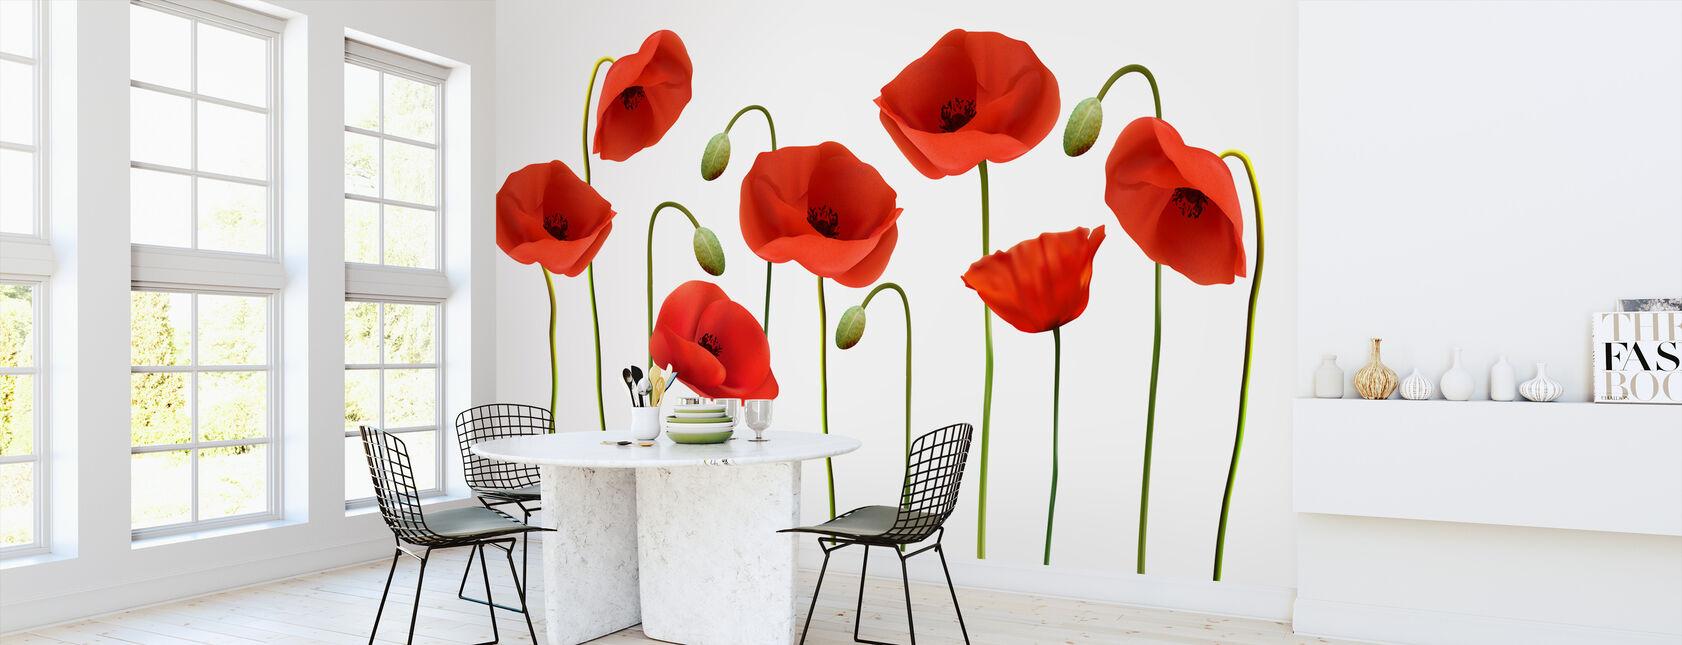 Rode klaprozen - Behang - Keuken